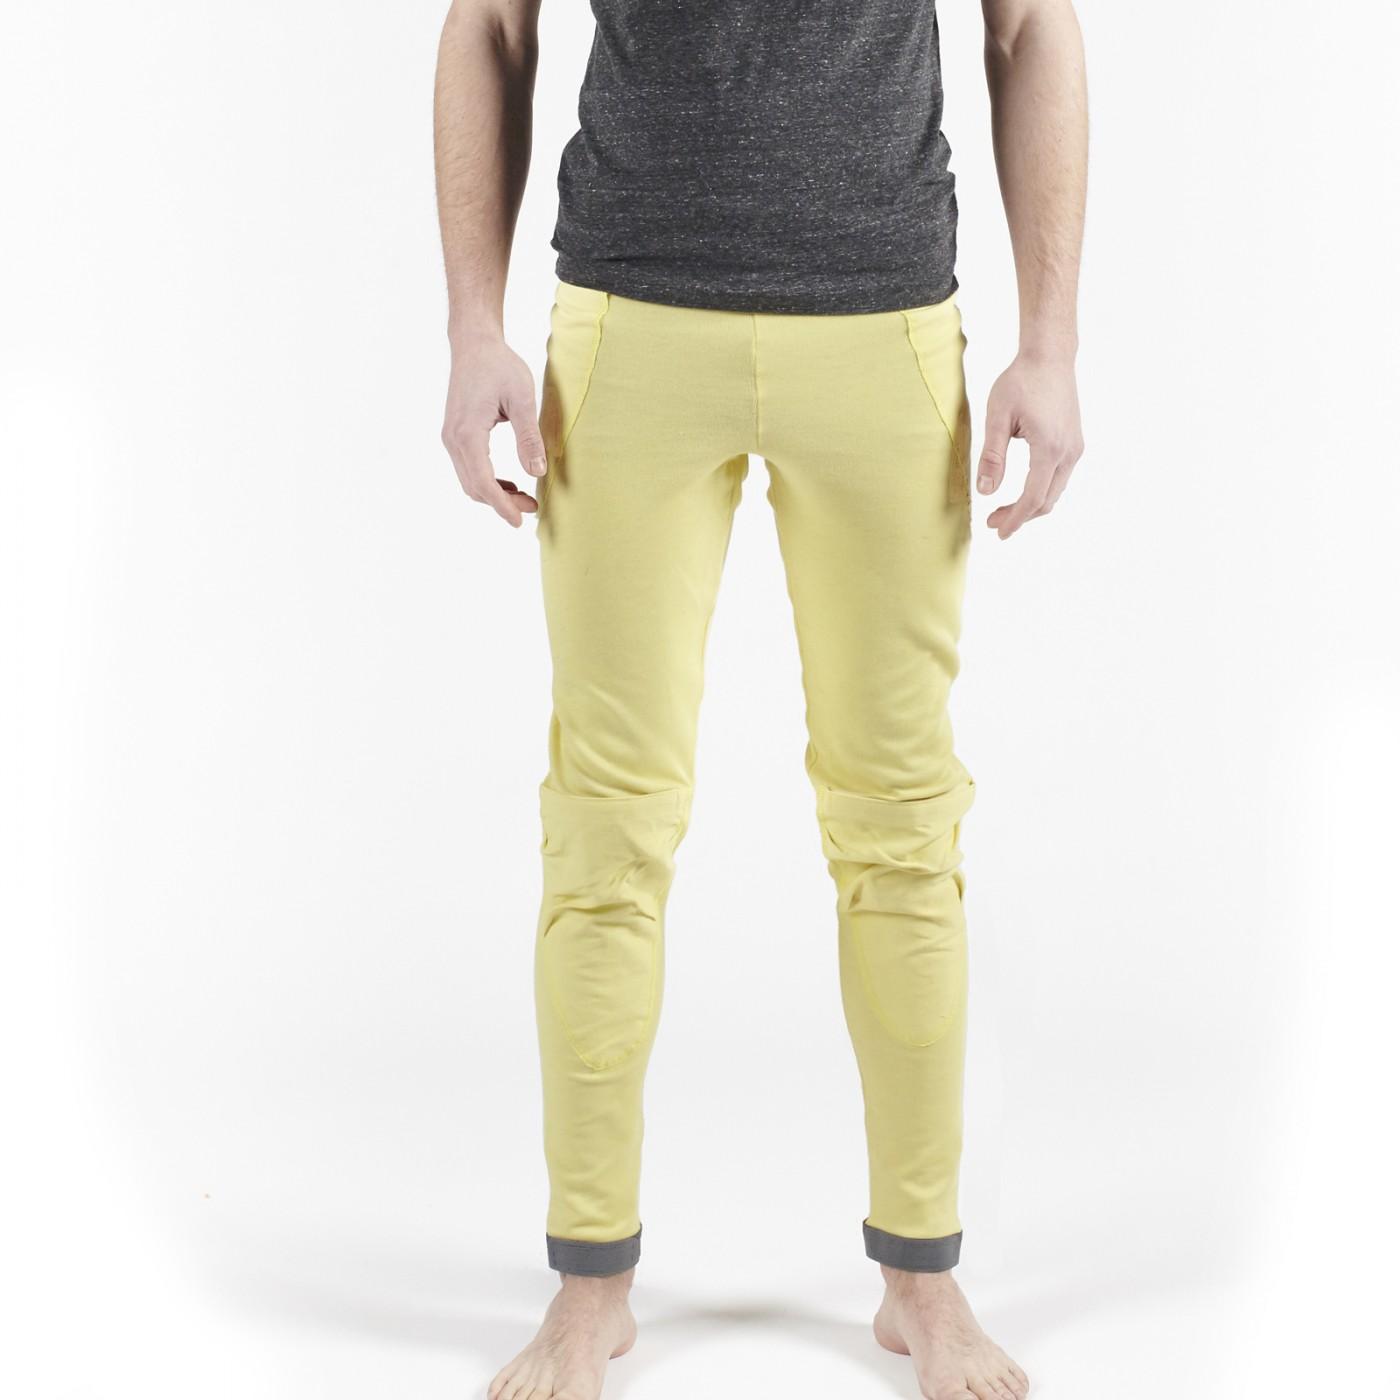 bowtex-sous-pantalon-kevlar